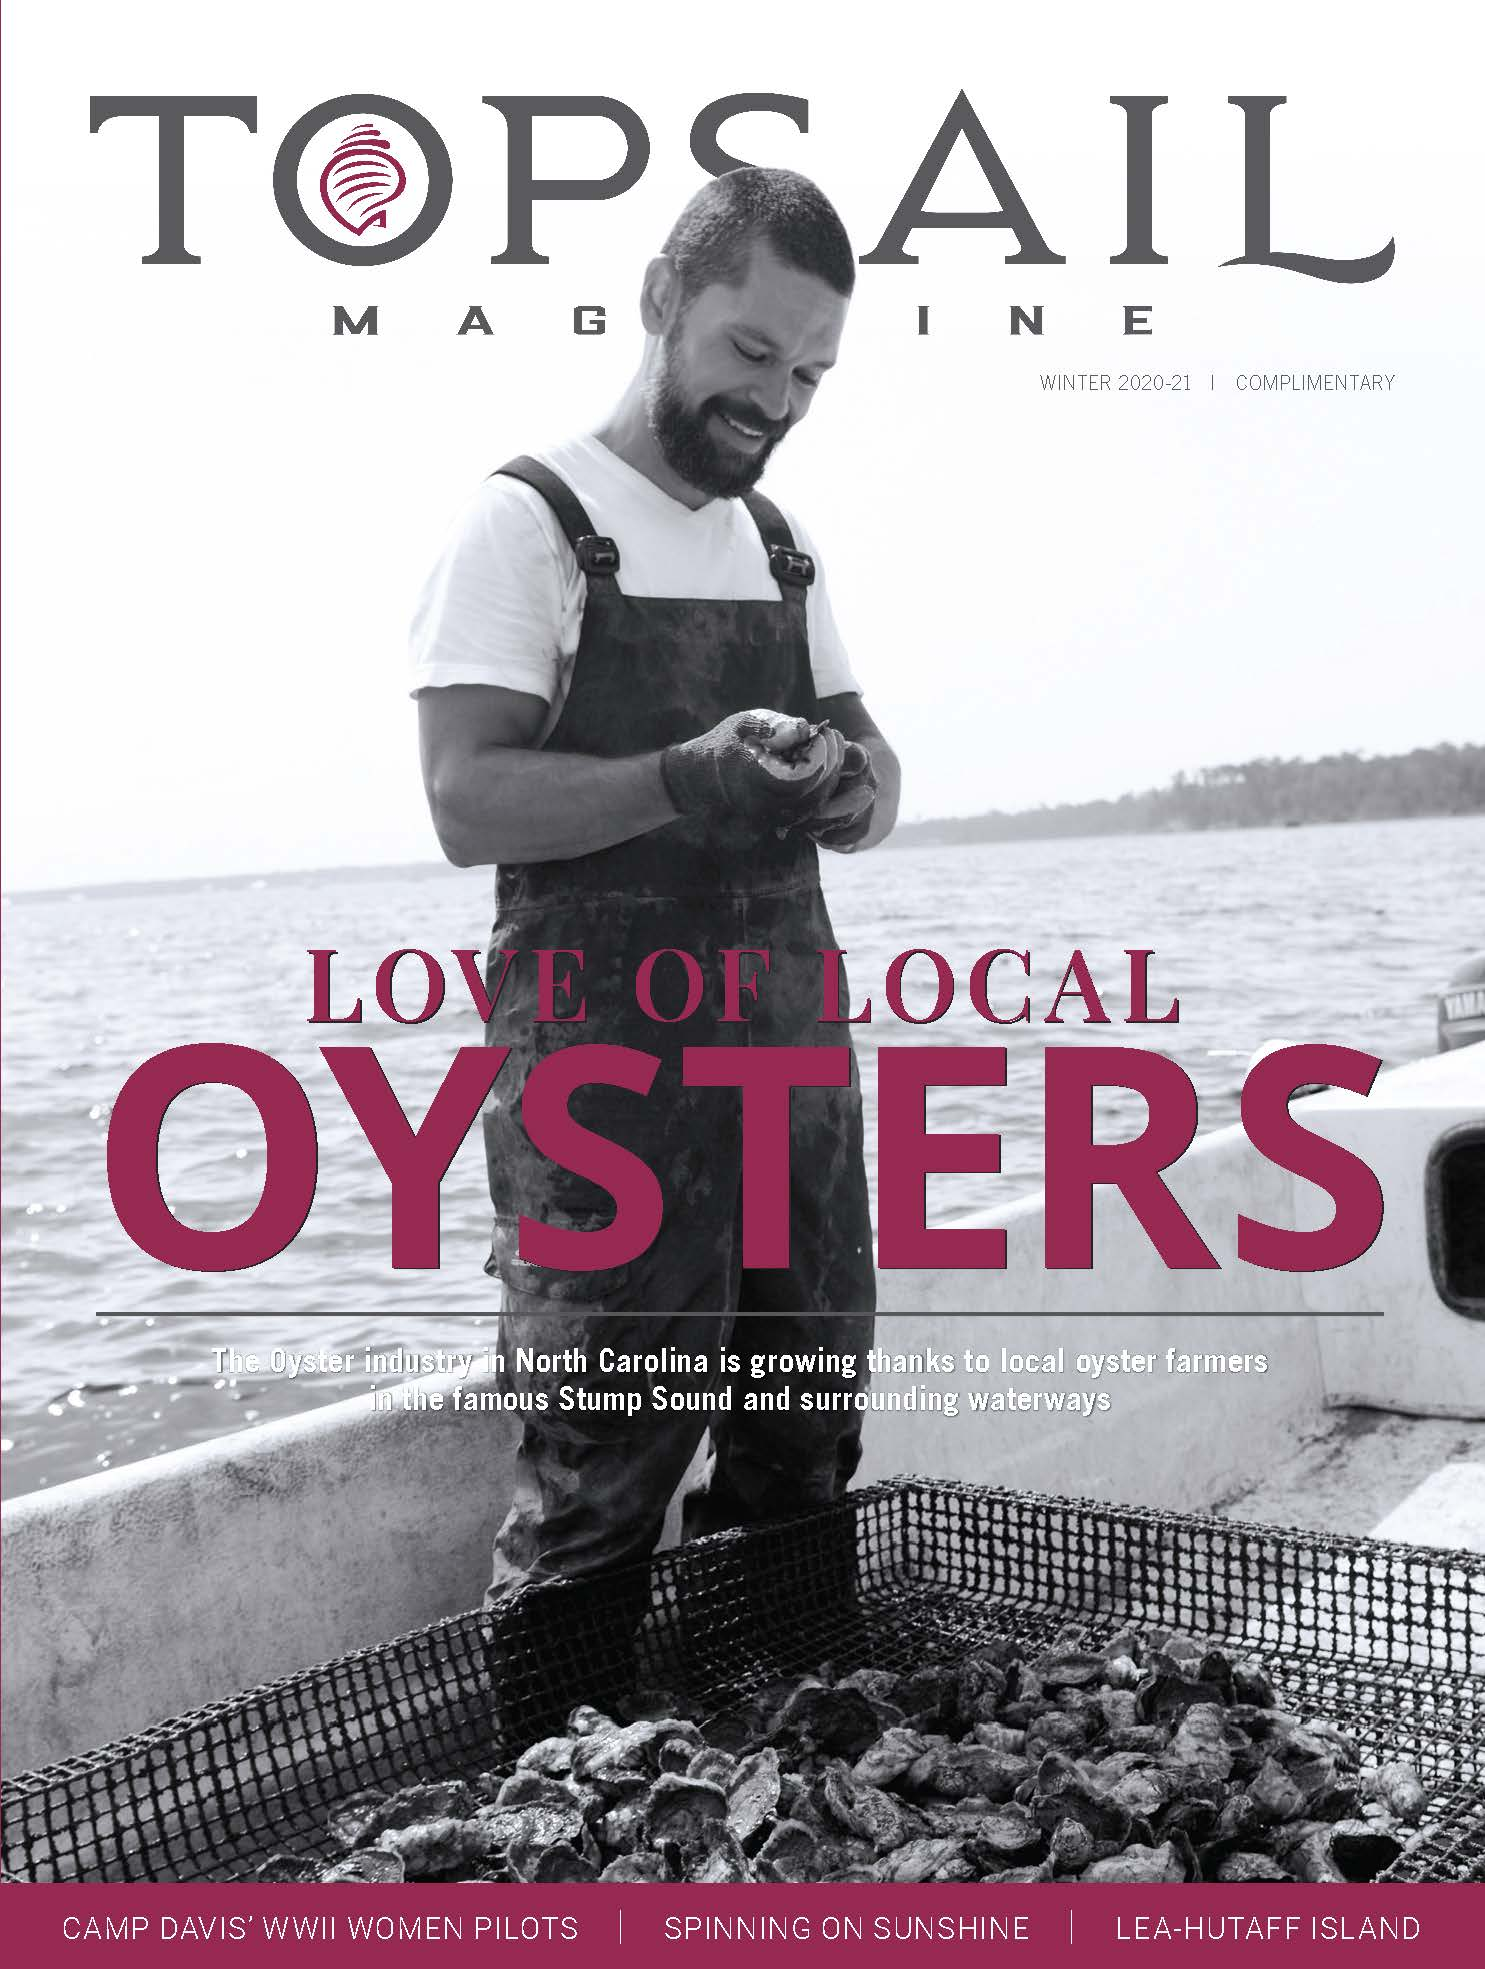 Topsail Magazine Winter 2020-21 Digital Edition